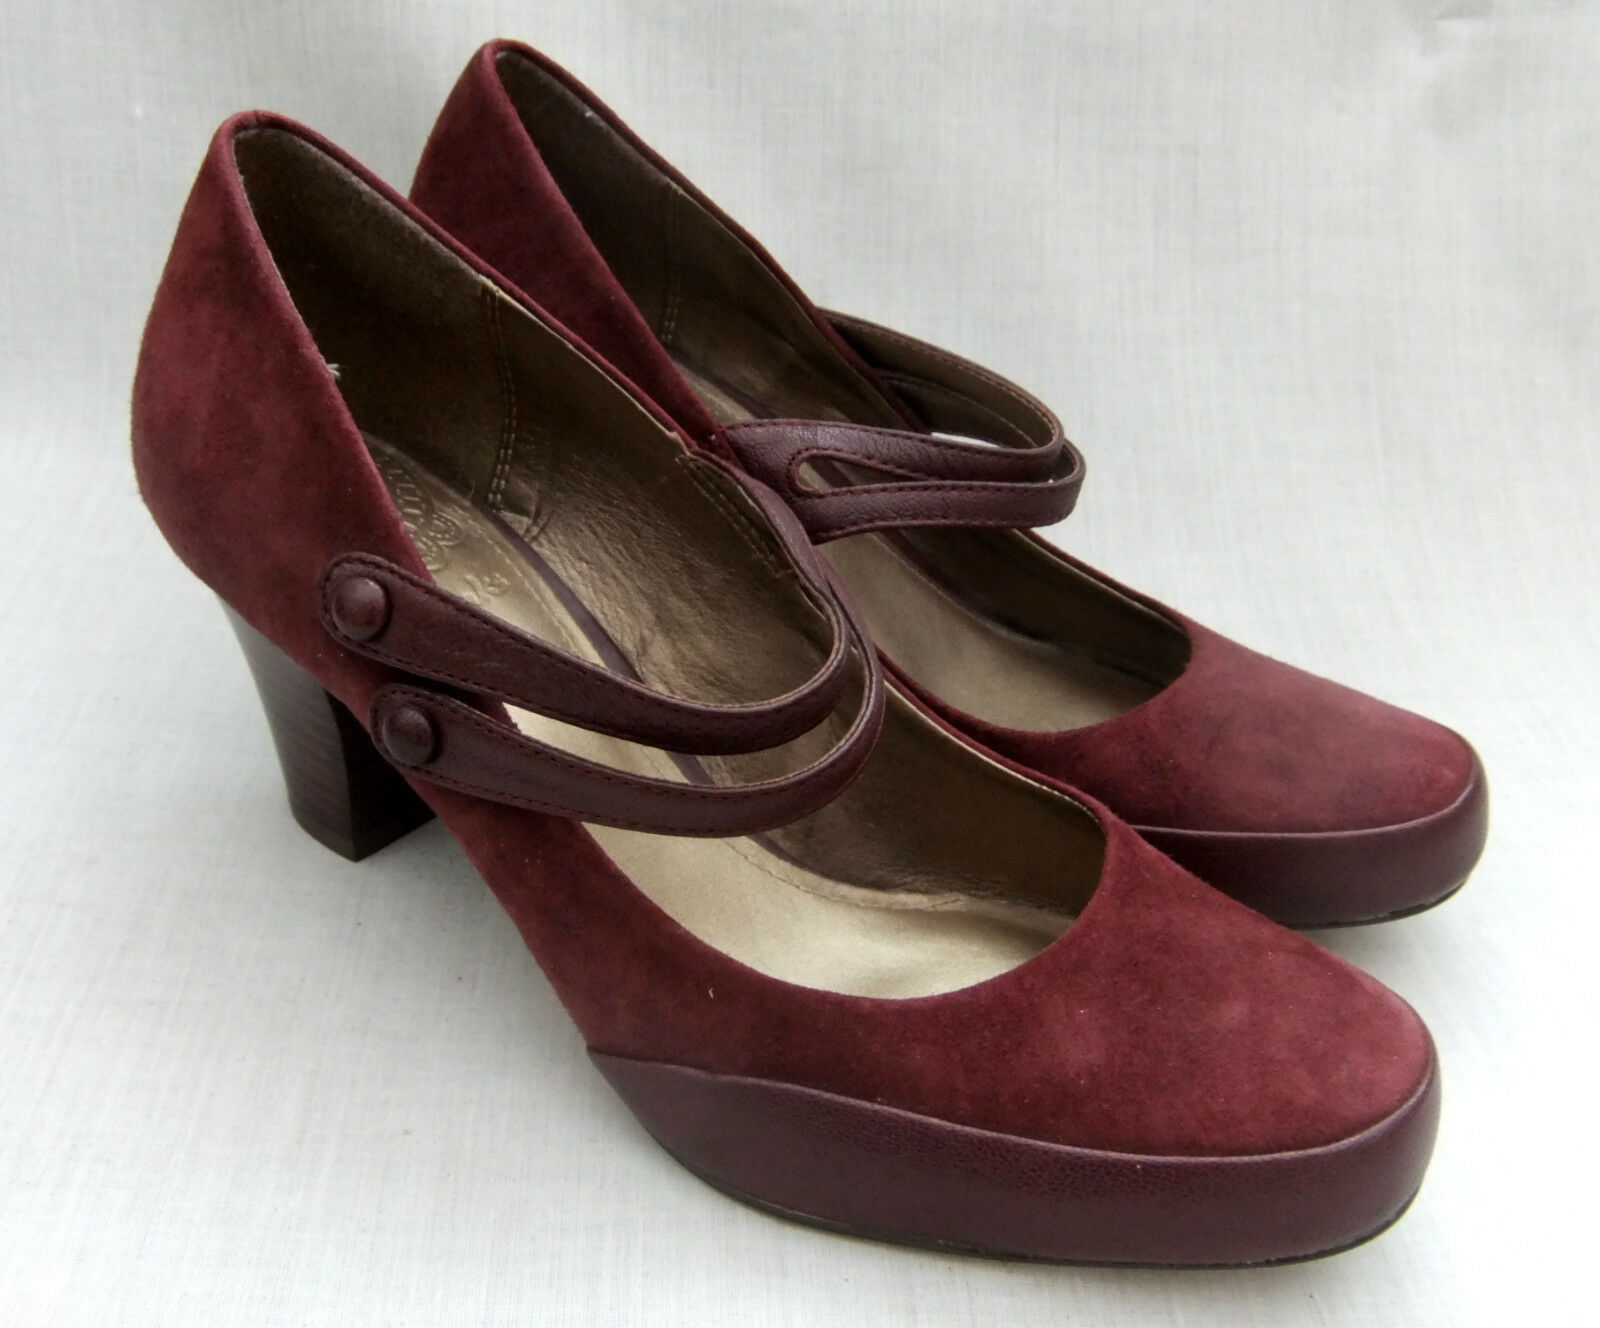 New Clarks Alpine or Femme Bordeaux Daim Chaussures